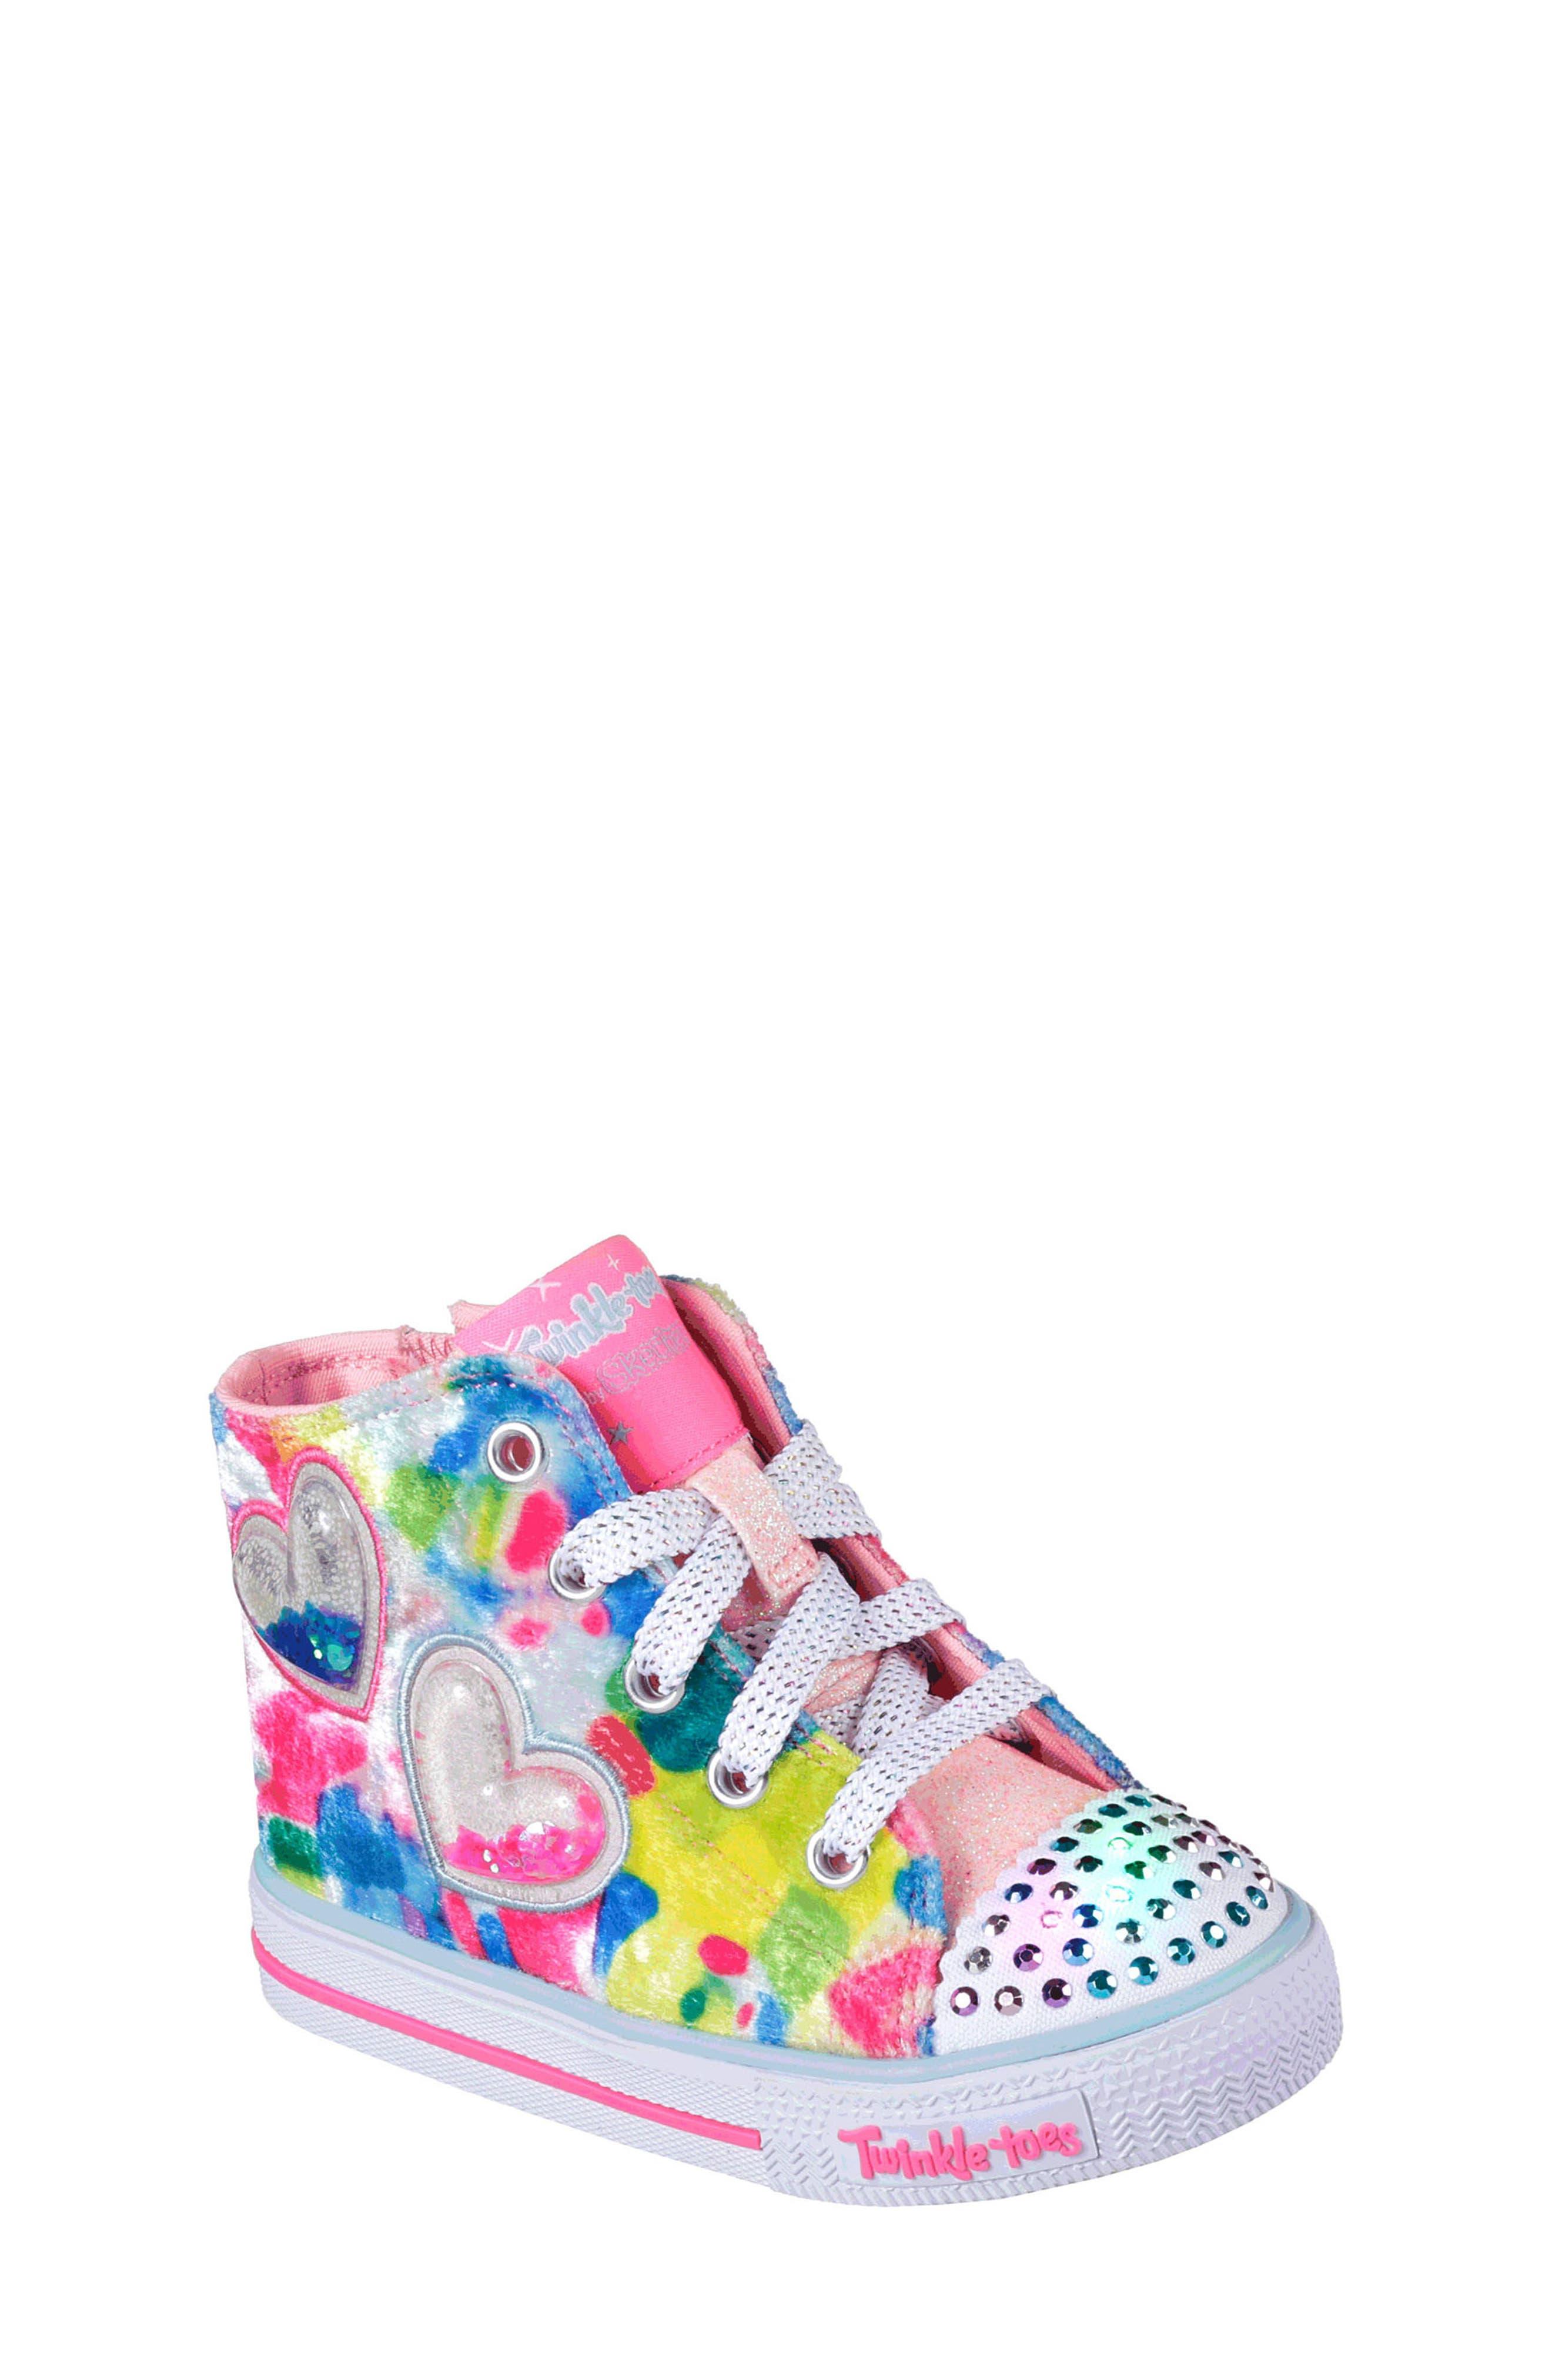 Alternate Image 1 Selected - SKECHERS Twinkle Toes Shuffles Light-Up High Top Sneaker (Walker & Toddler)